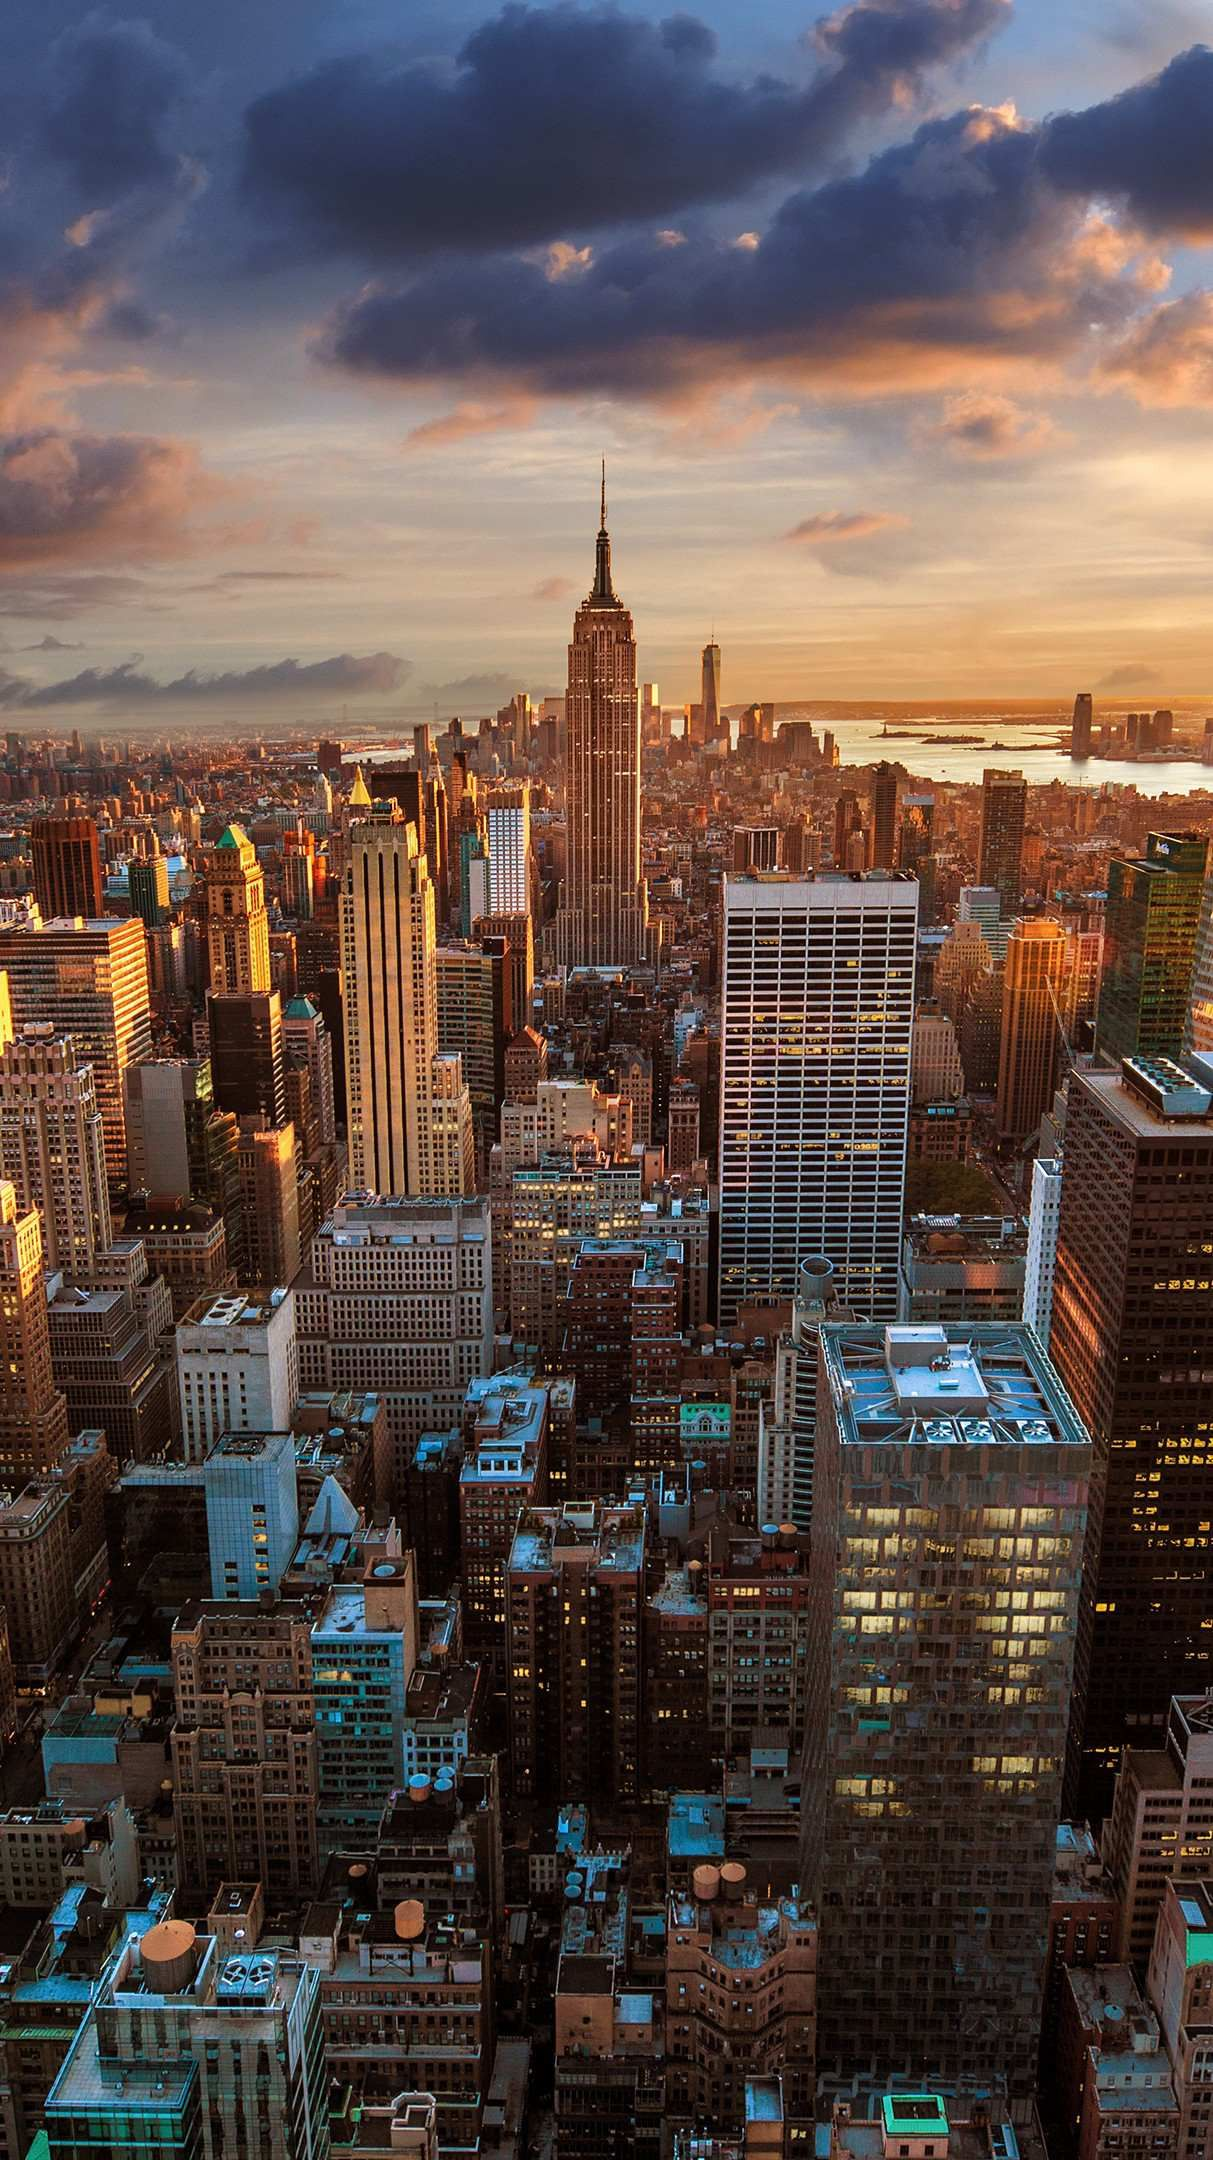 Di vanessa svalvolata, seguita da 390 persone su pinterest. Newyork Empire State Building Sunset Wallpaper Wallpaper New York Wallpaper City Wallpaper York Wallpaper